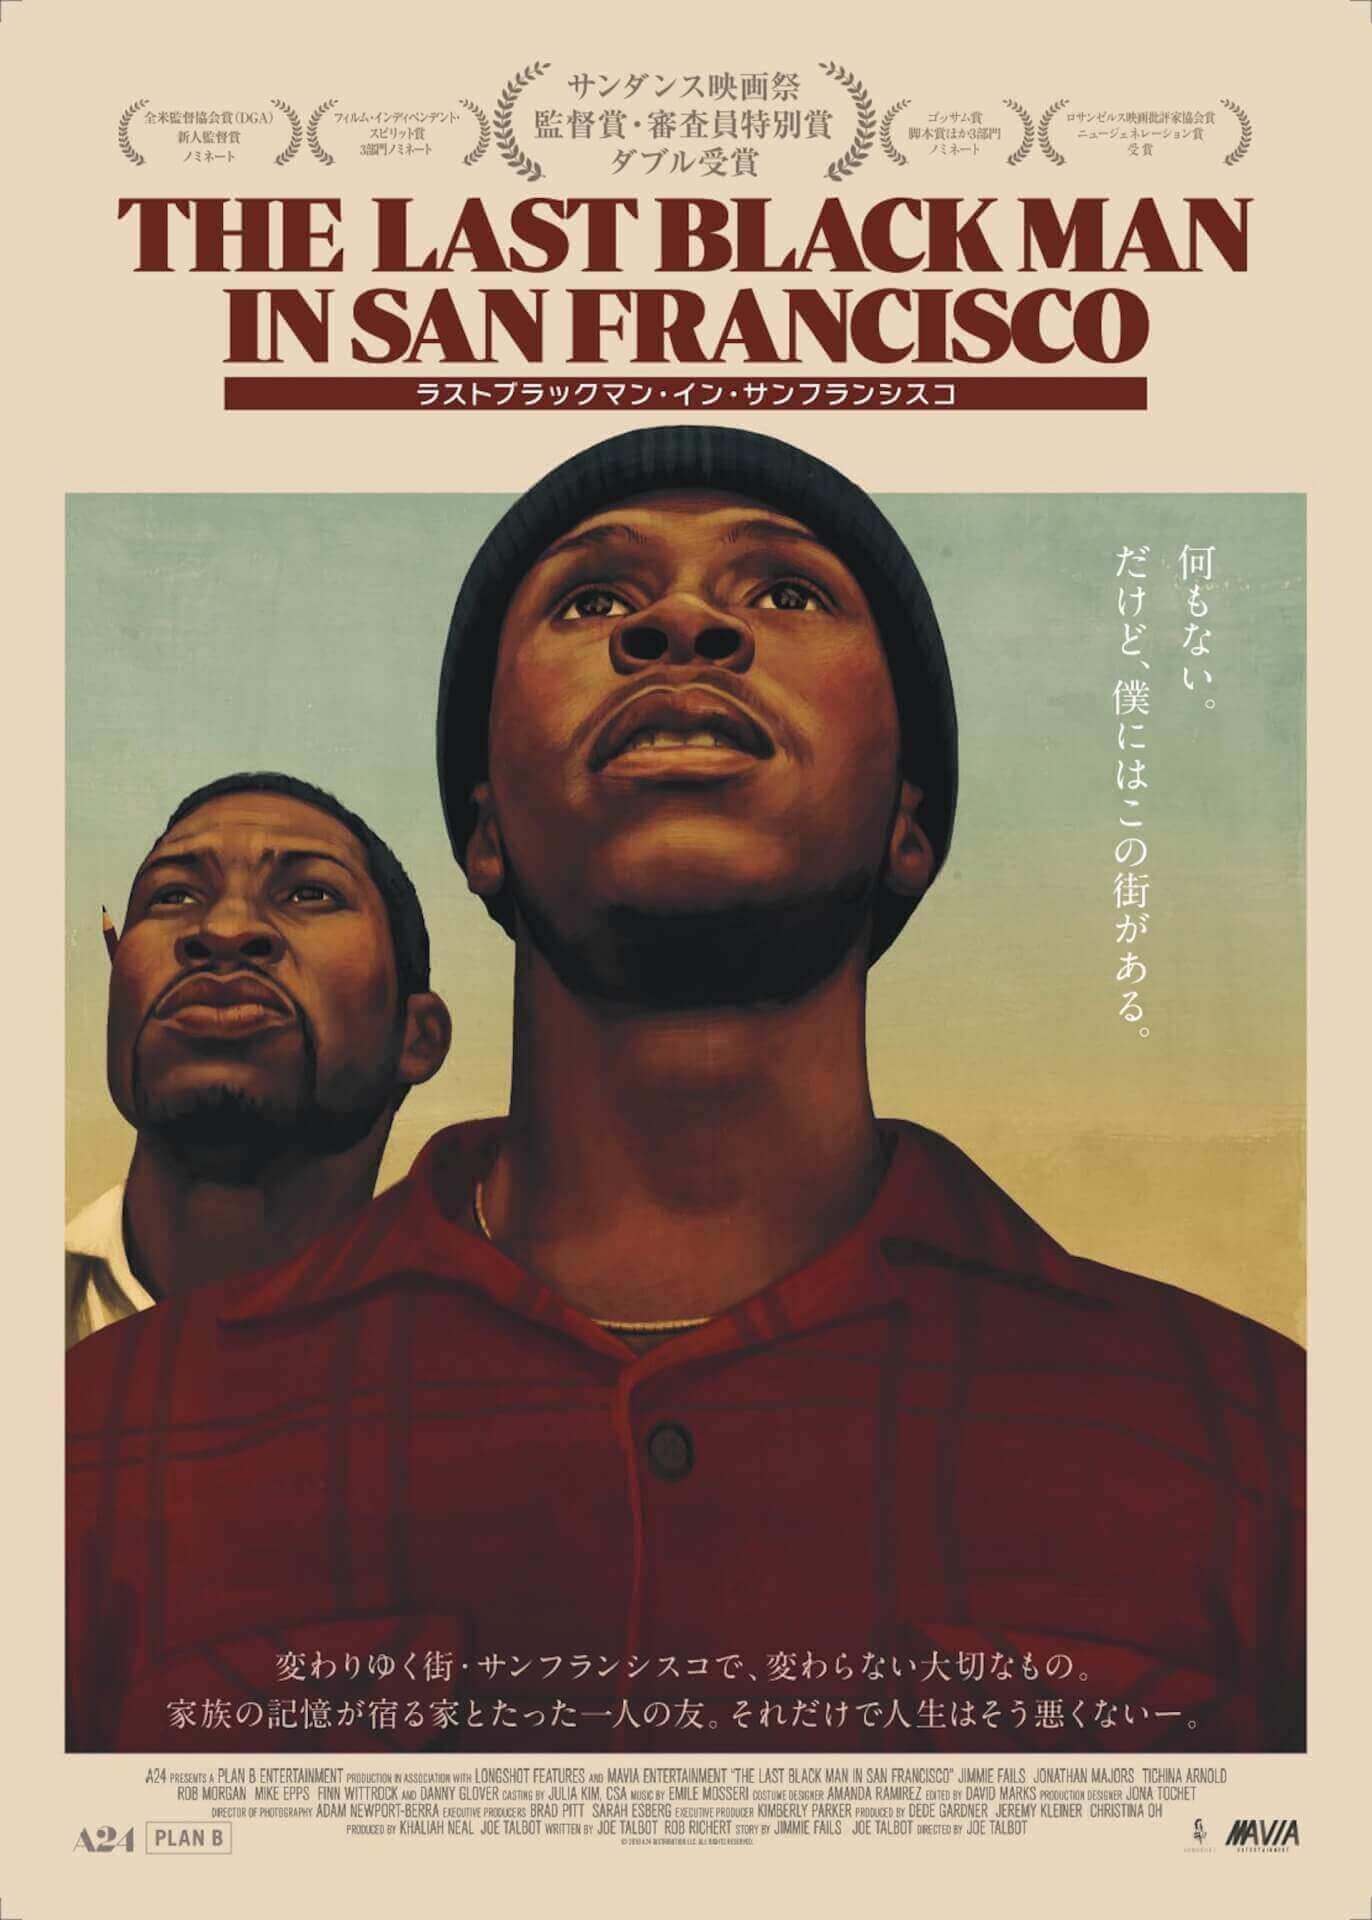 film201001_lastblackmaninsf_5 A24最新作『ラストブラックマン・イン・サンフランシスコ』が本日より全国公開!